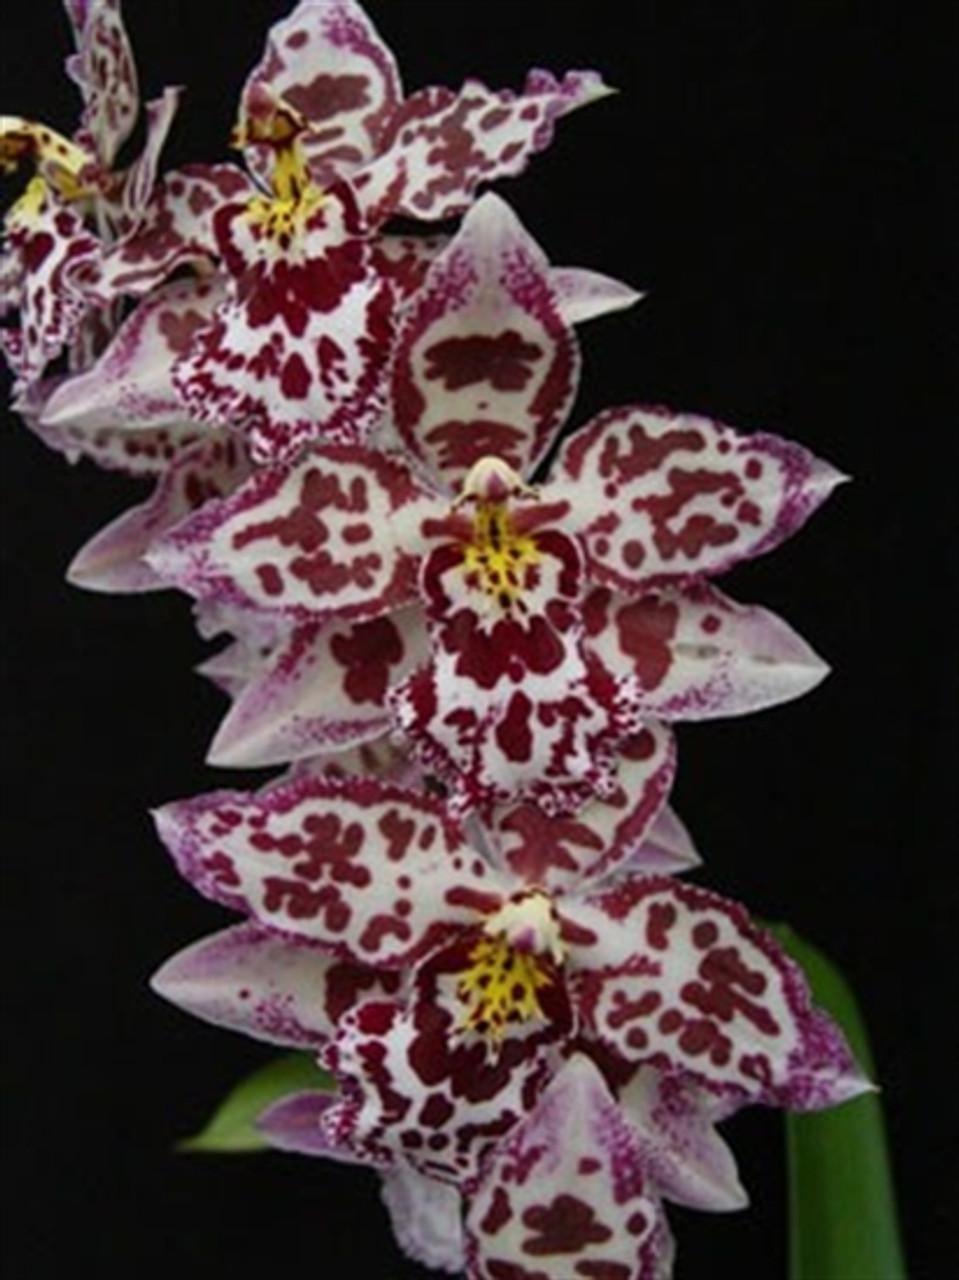 Odontocidium Margaret Holm 'Alpine' (Odm. bictoniense x Odm. Hans Koch)